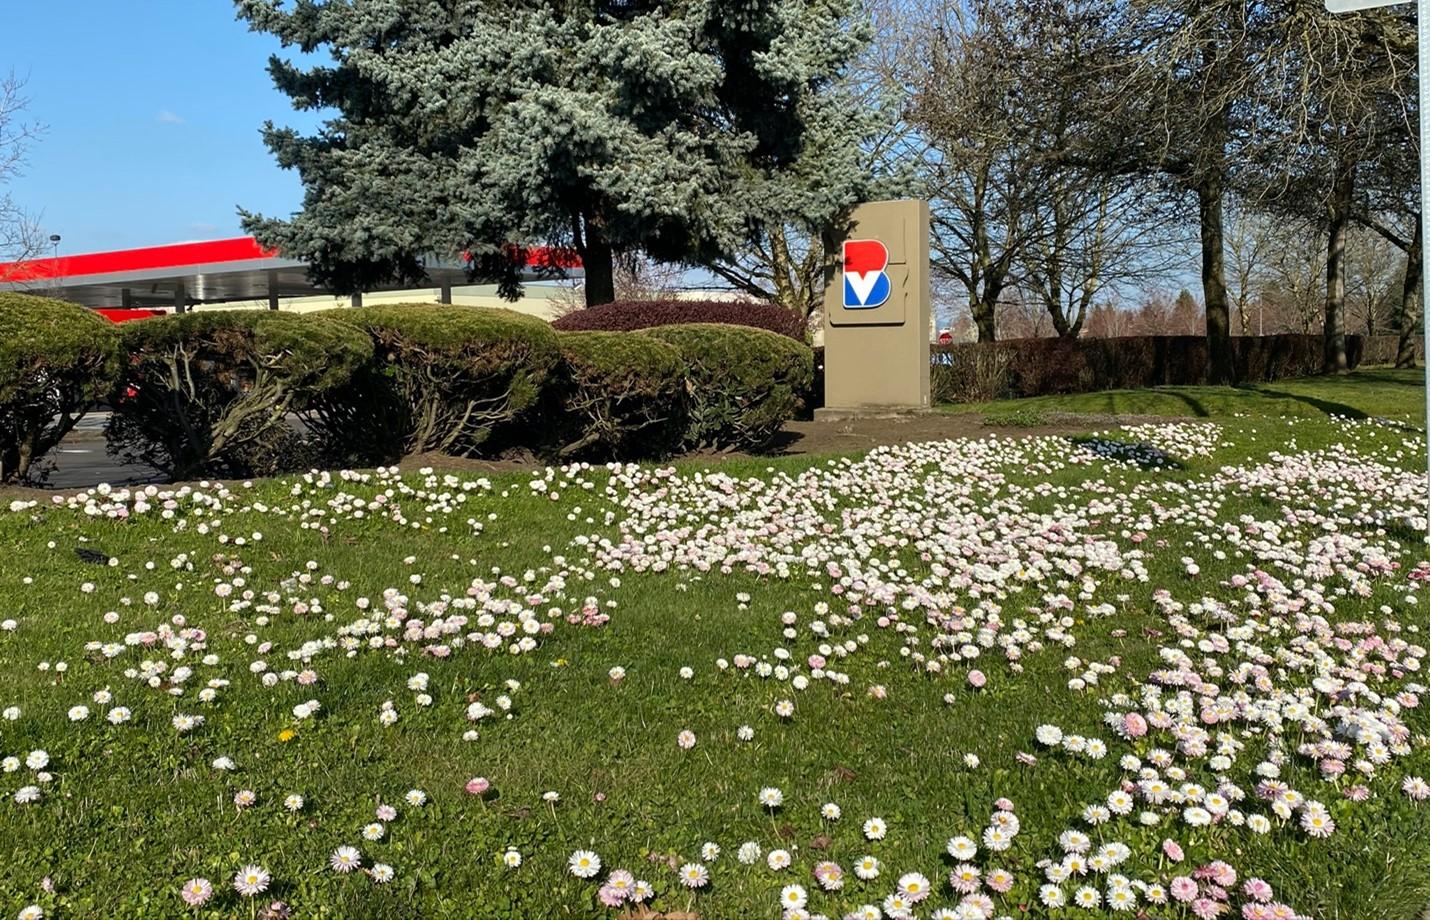 Let it Bee: Burgerville's Meadow Lawn is Ground Zero for Pollinators